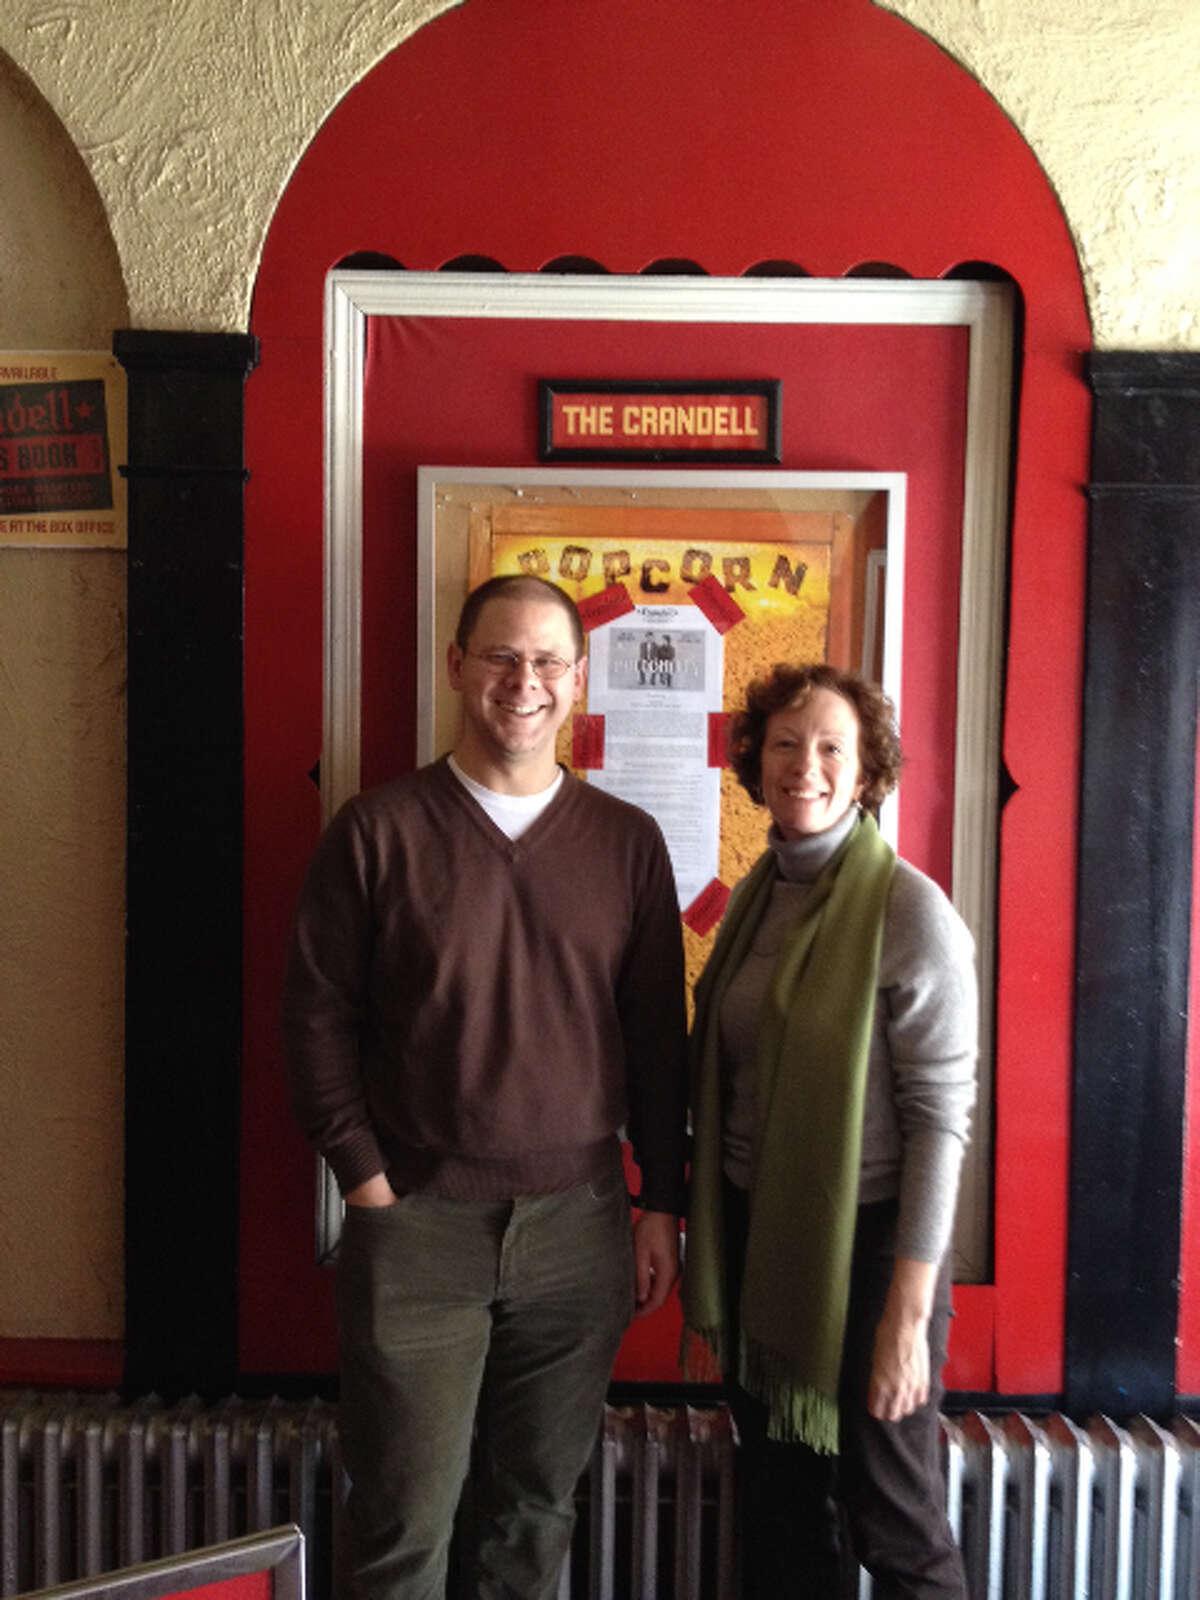 New Chatham Film Club board president Fred Ulrich and retiring founding president Sandi Knakal